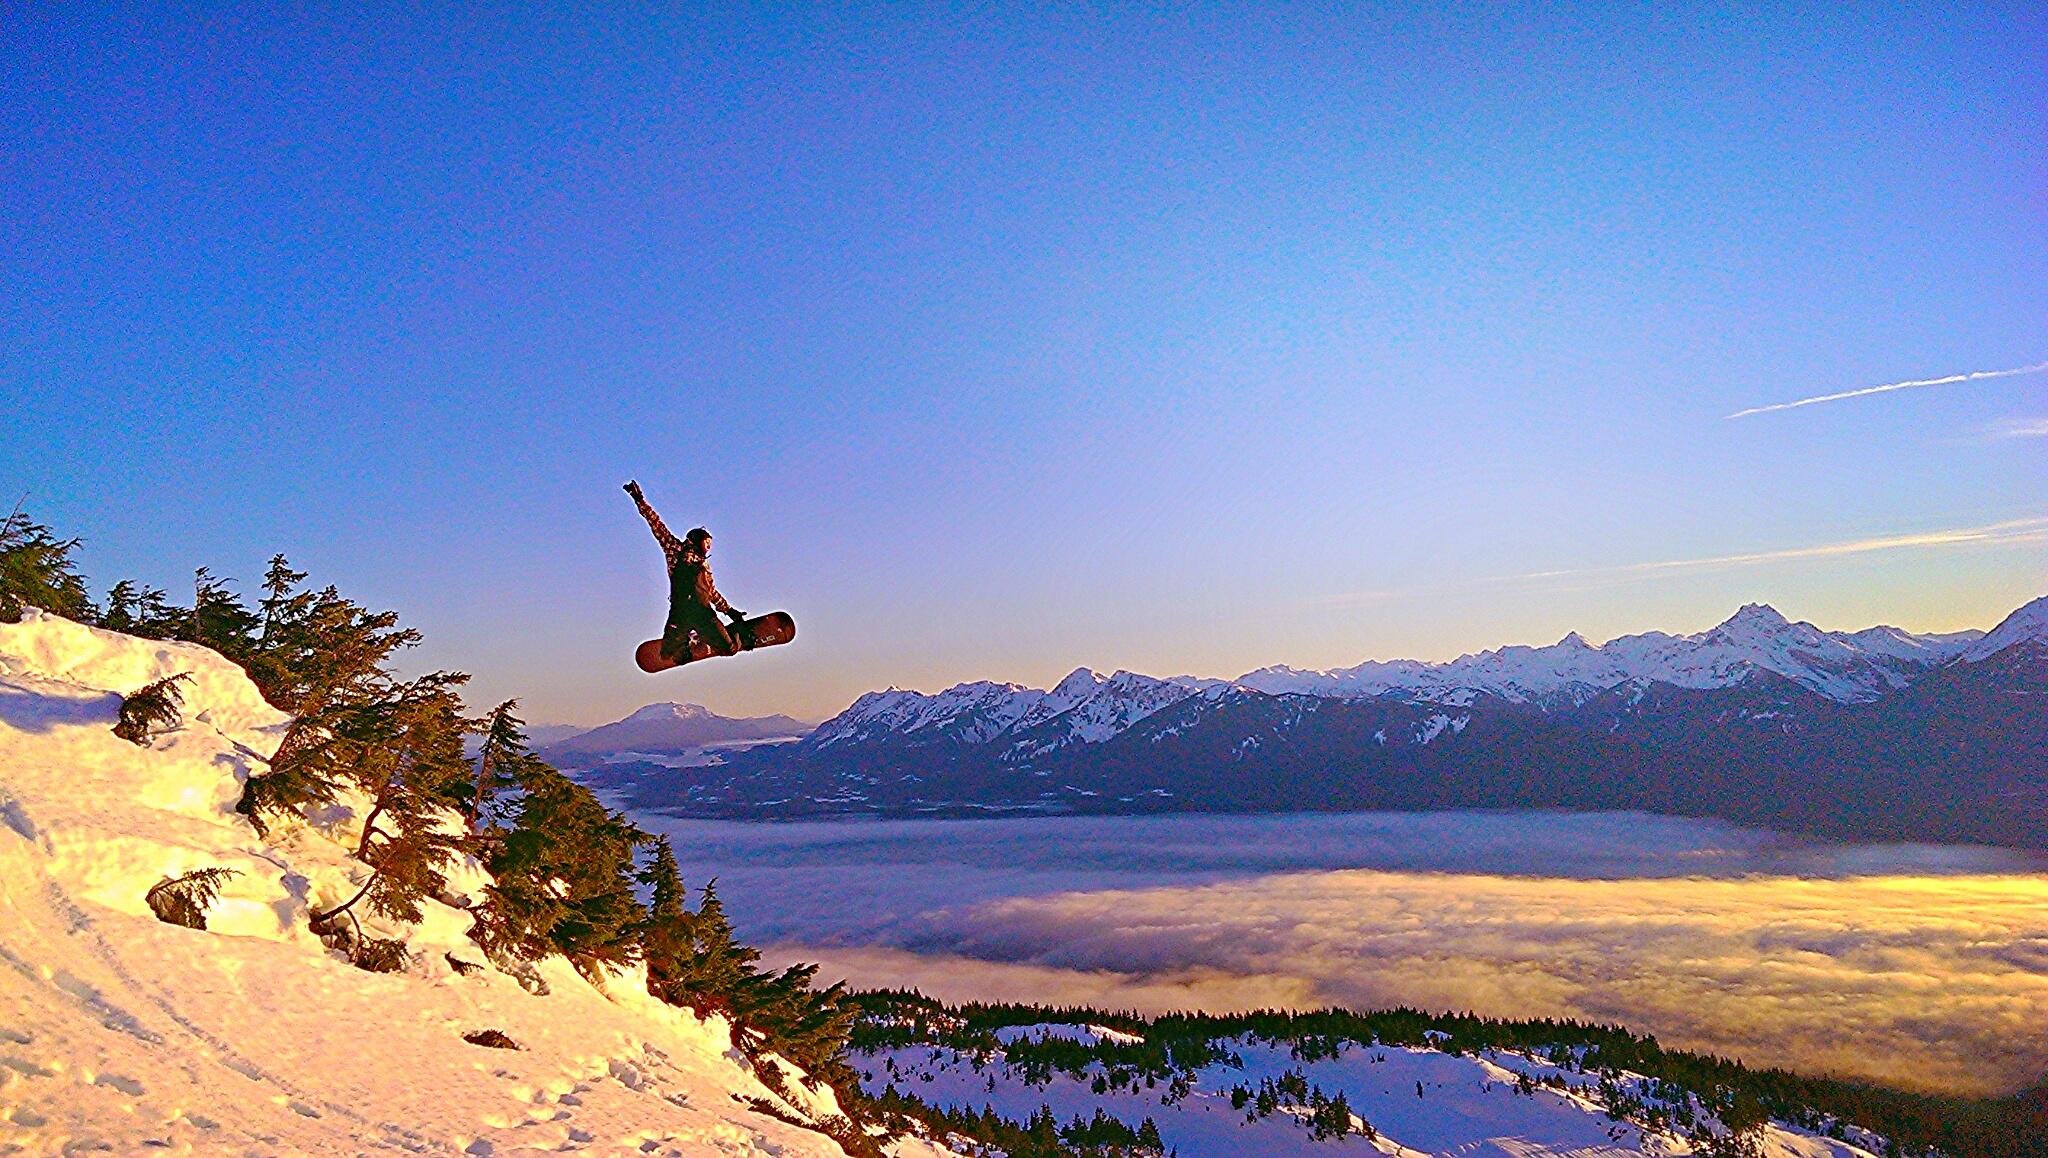 Snowboard at Eaglecrest Ski Area